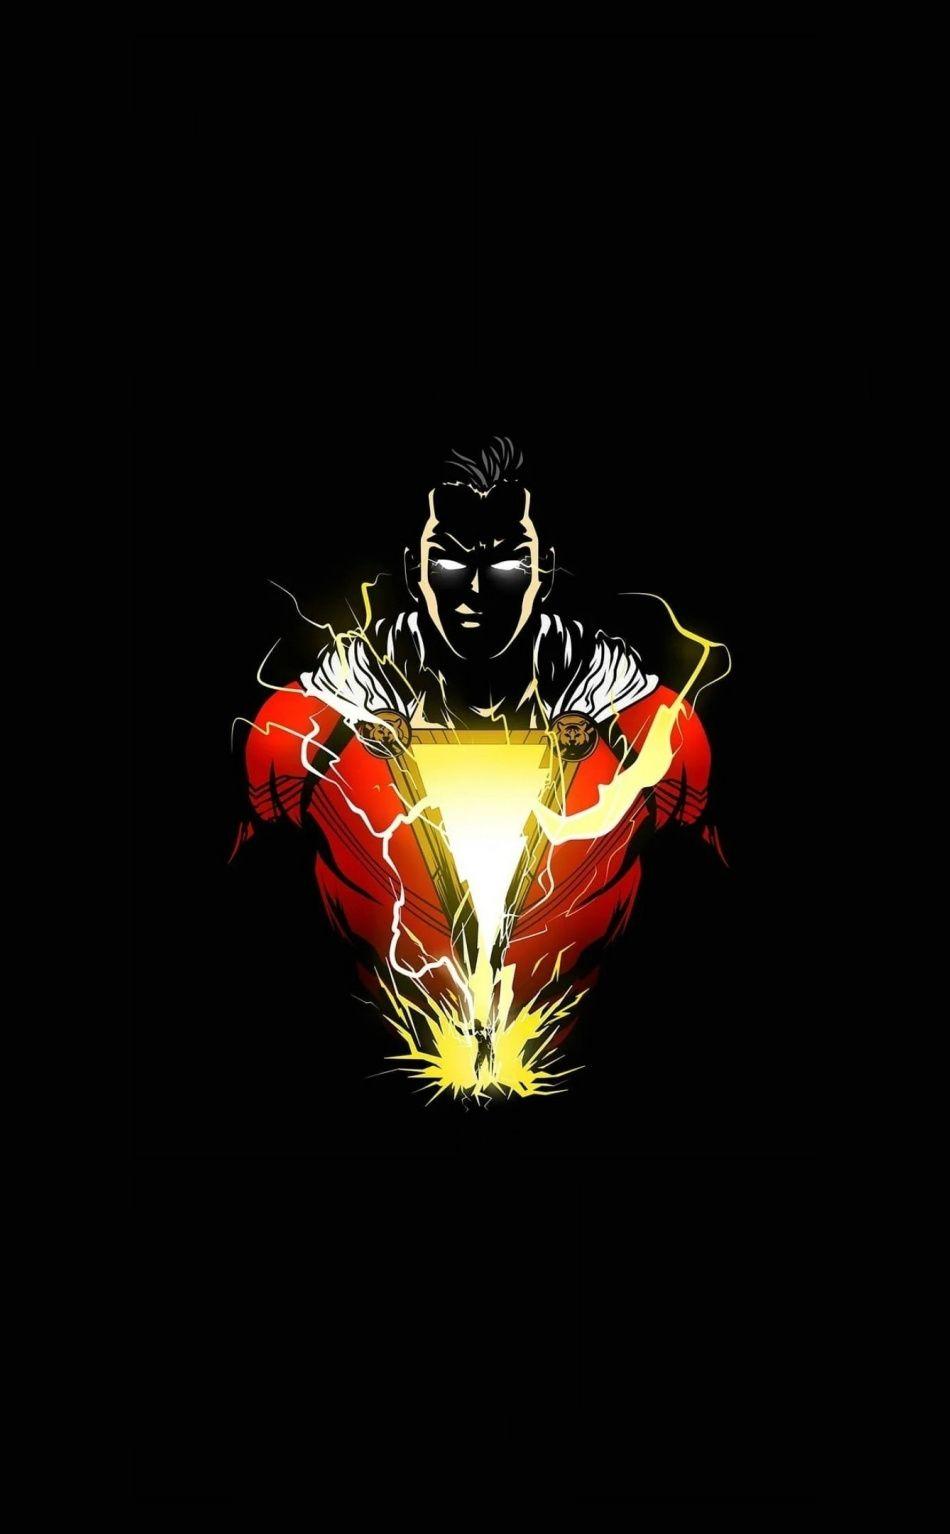 Angry Shazam, superhero, minimalist, 950x1534 wallpaper